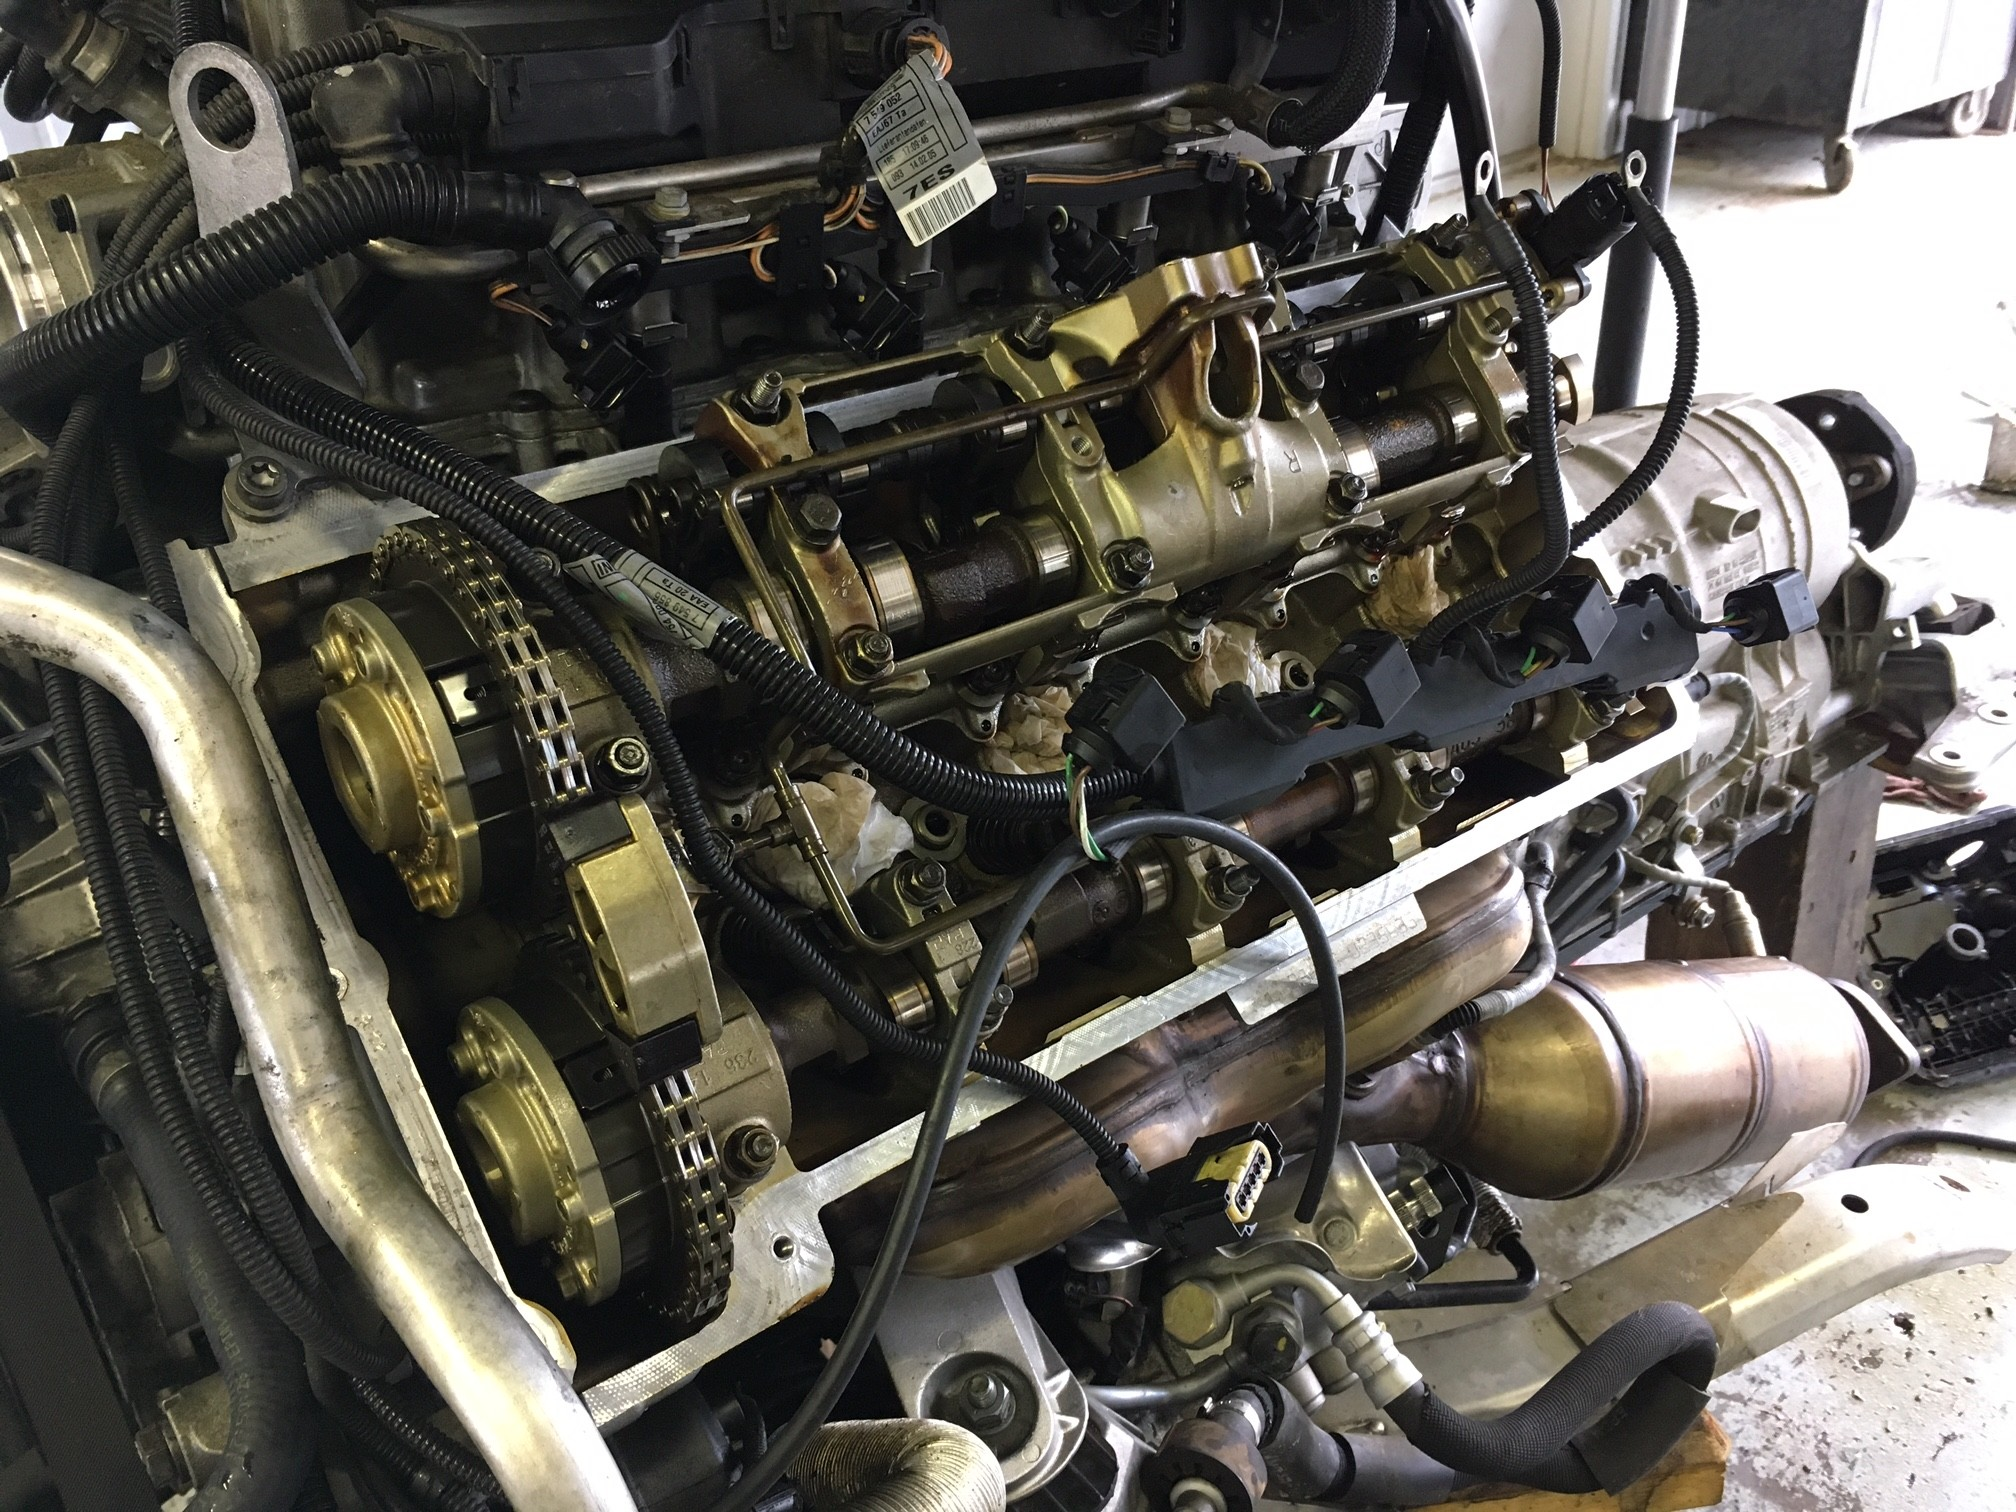 a Lexus car engine